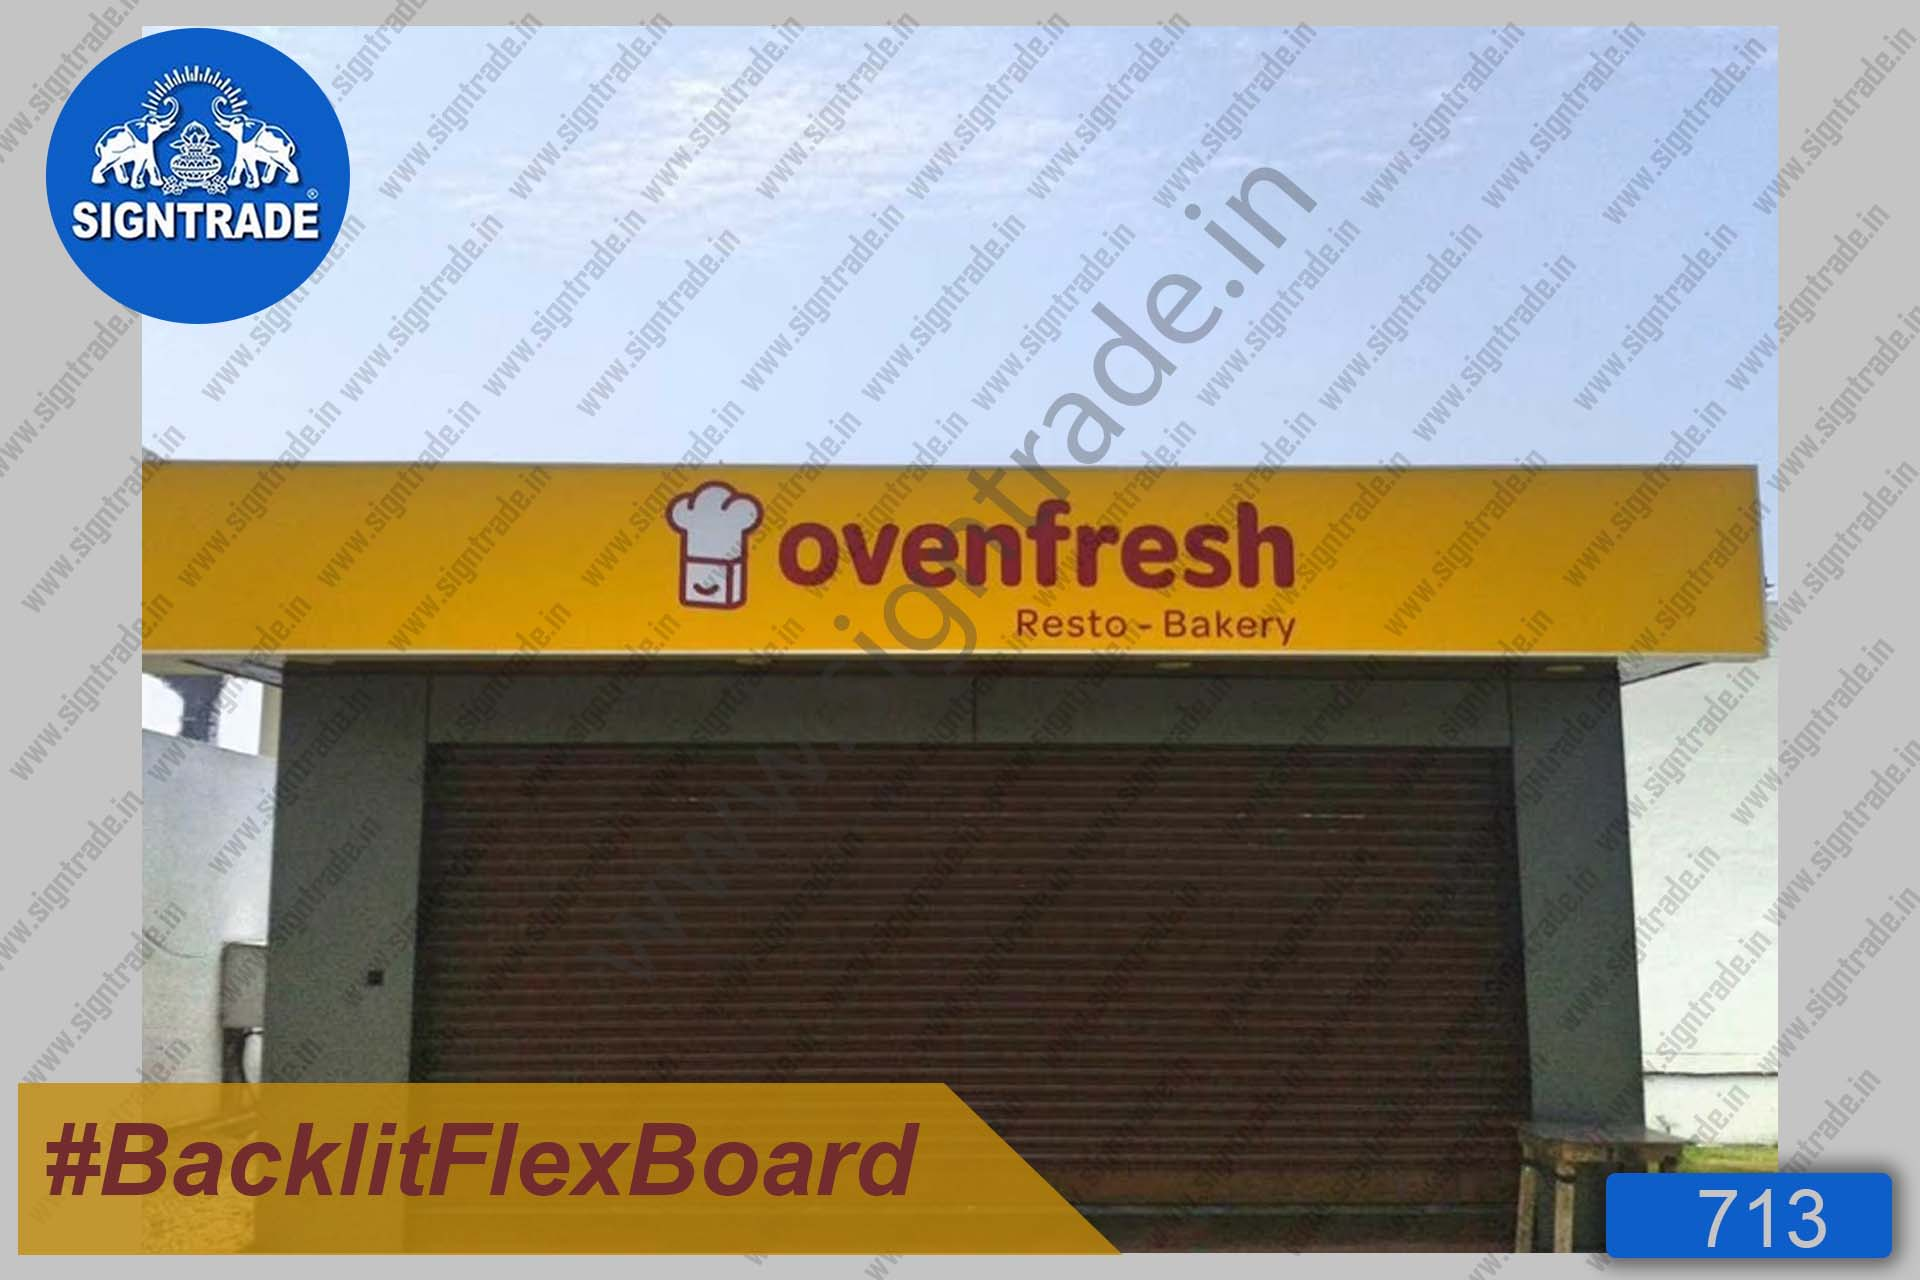 Oven Fresh Resto Bakery - Backlit Flex Board